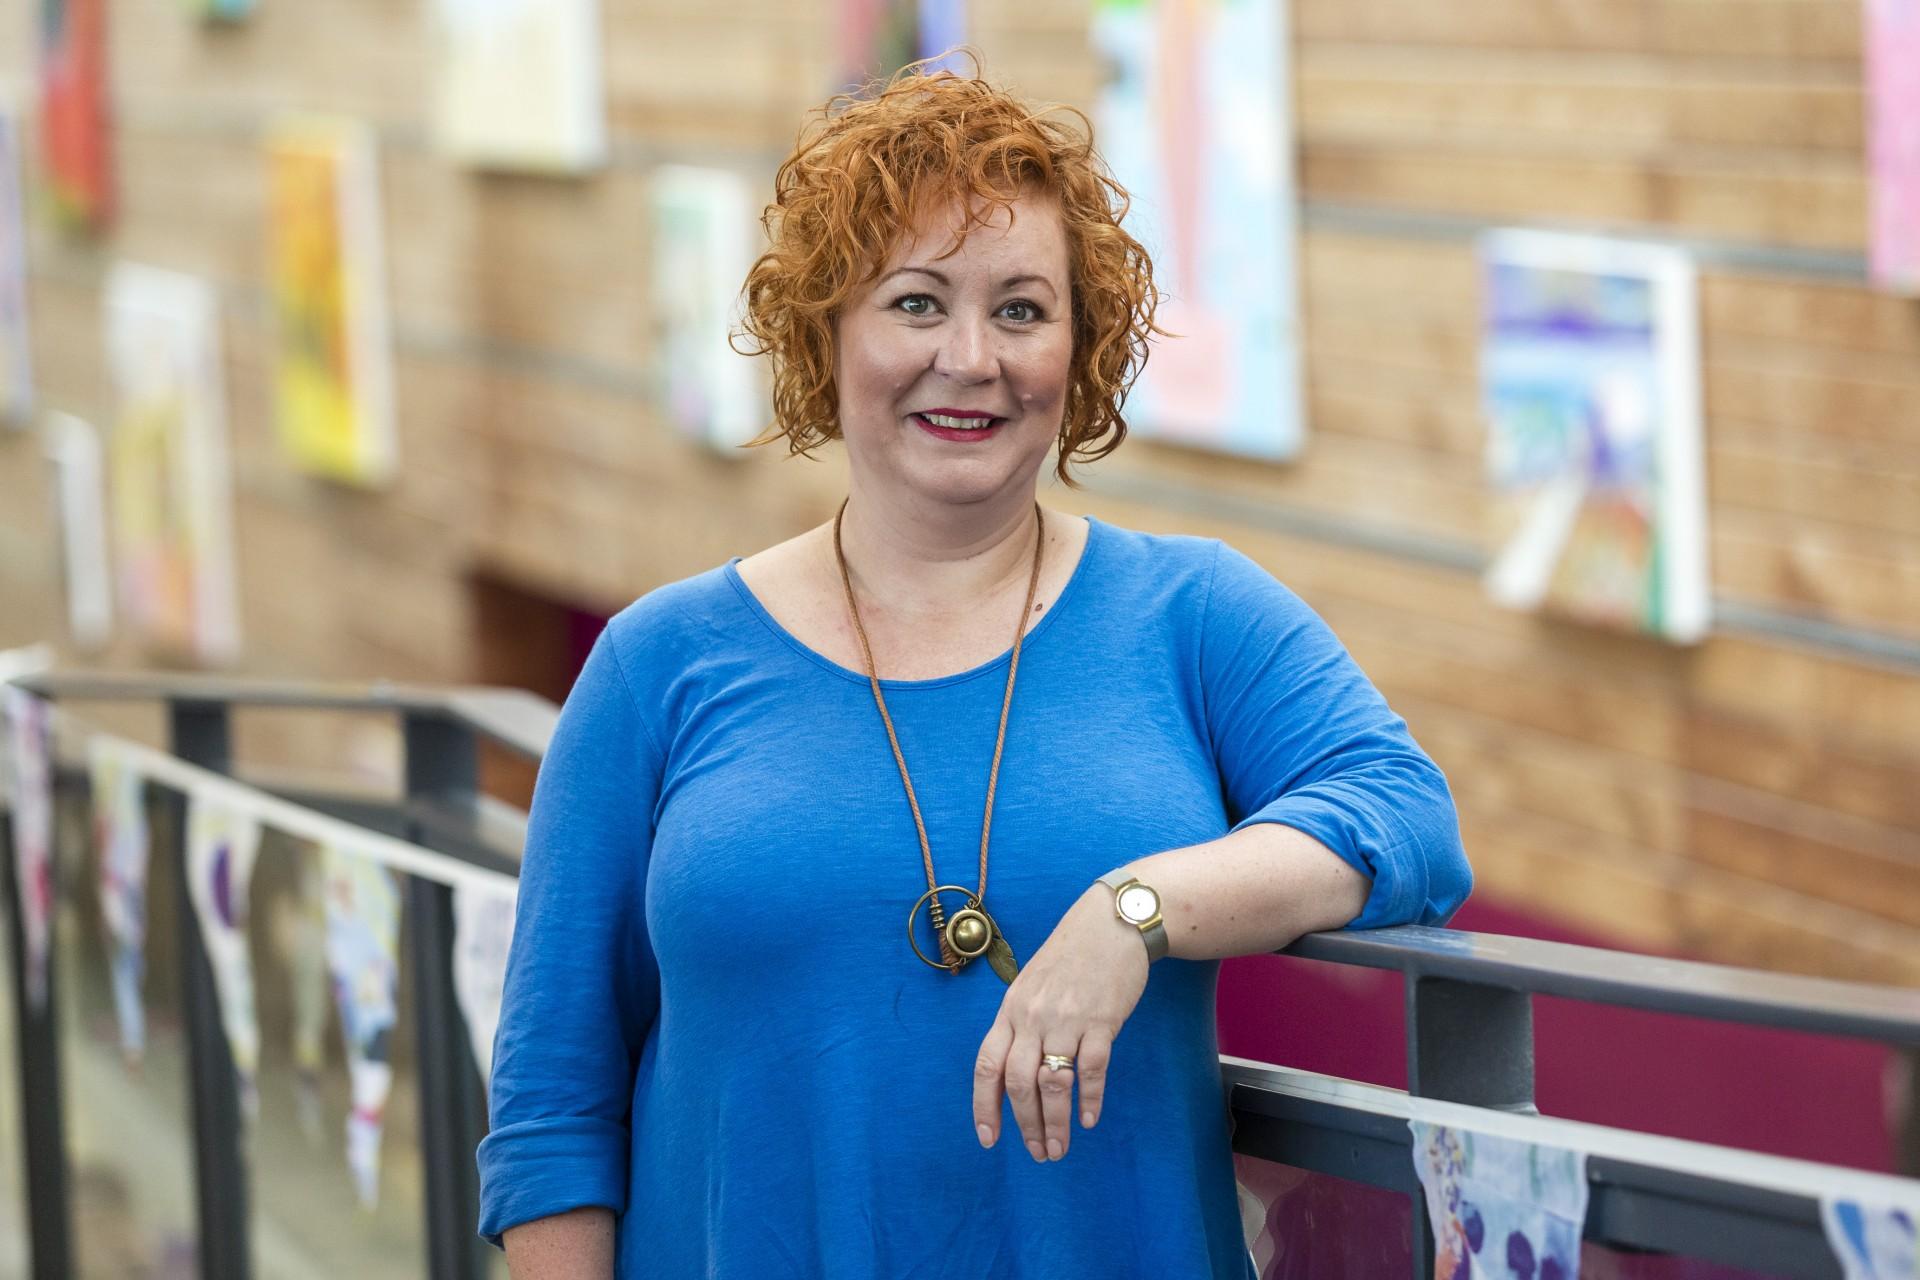 Rachel (Image: Iain McLean)